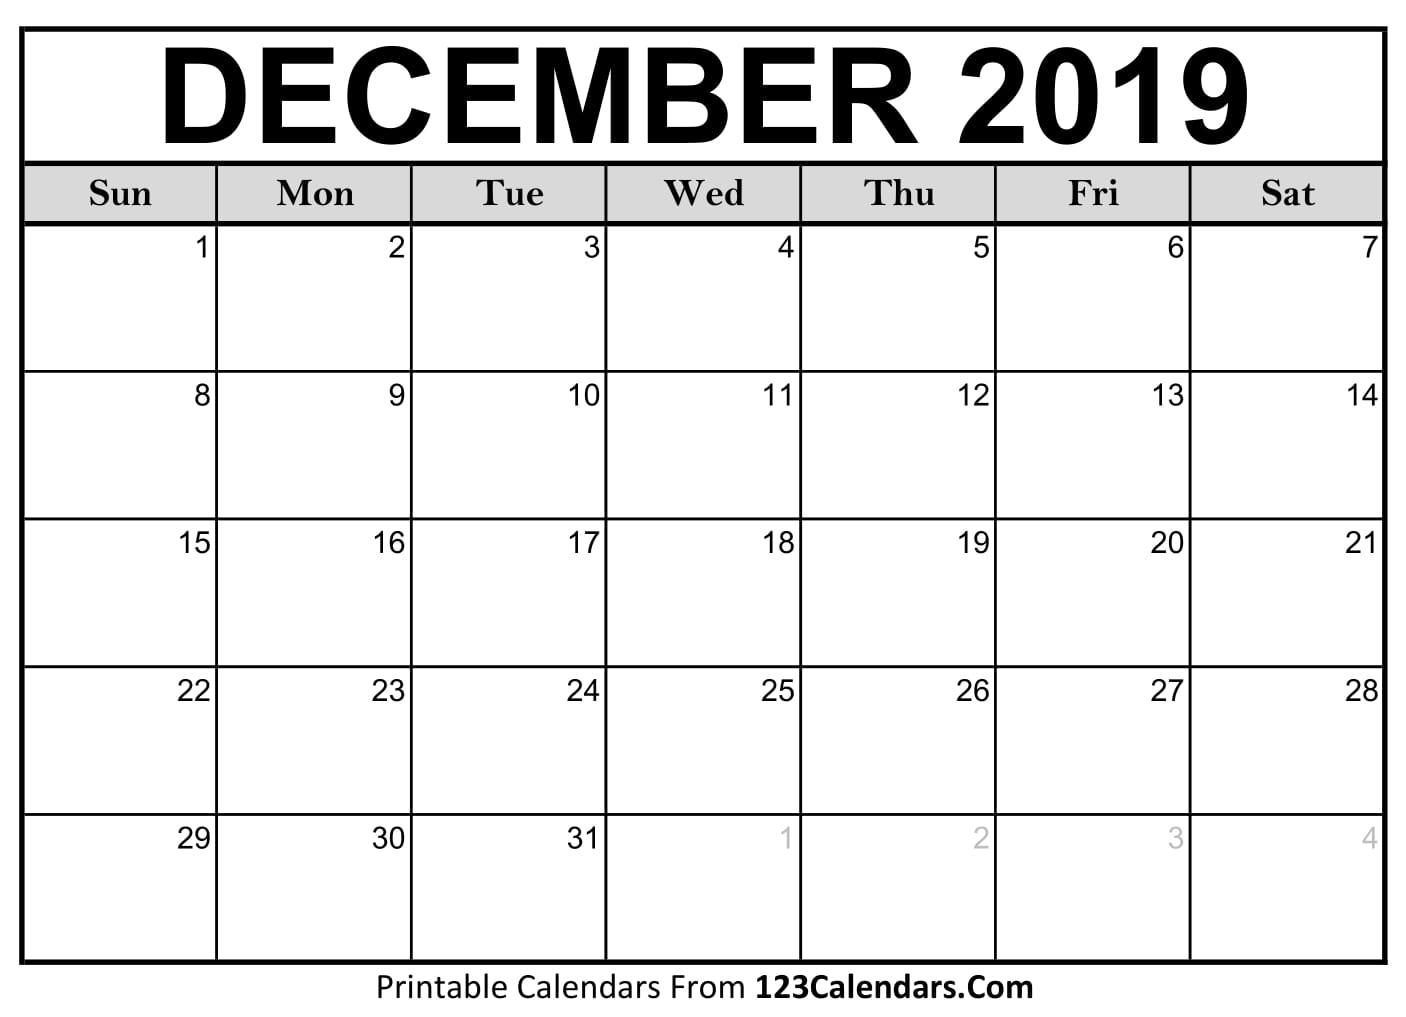 December 2019 Printable Calendar | 123Calendars inside Blank Printable December Calandar